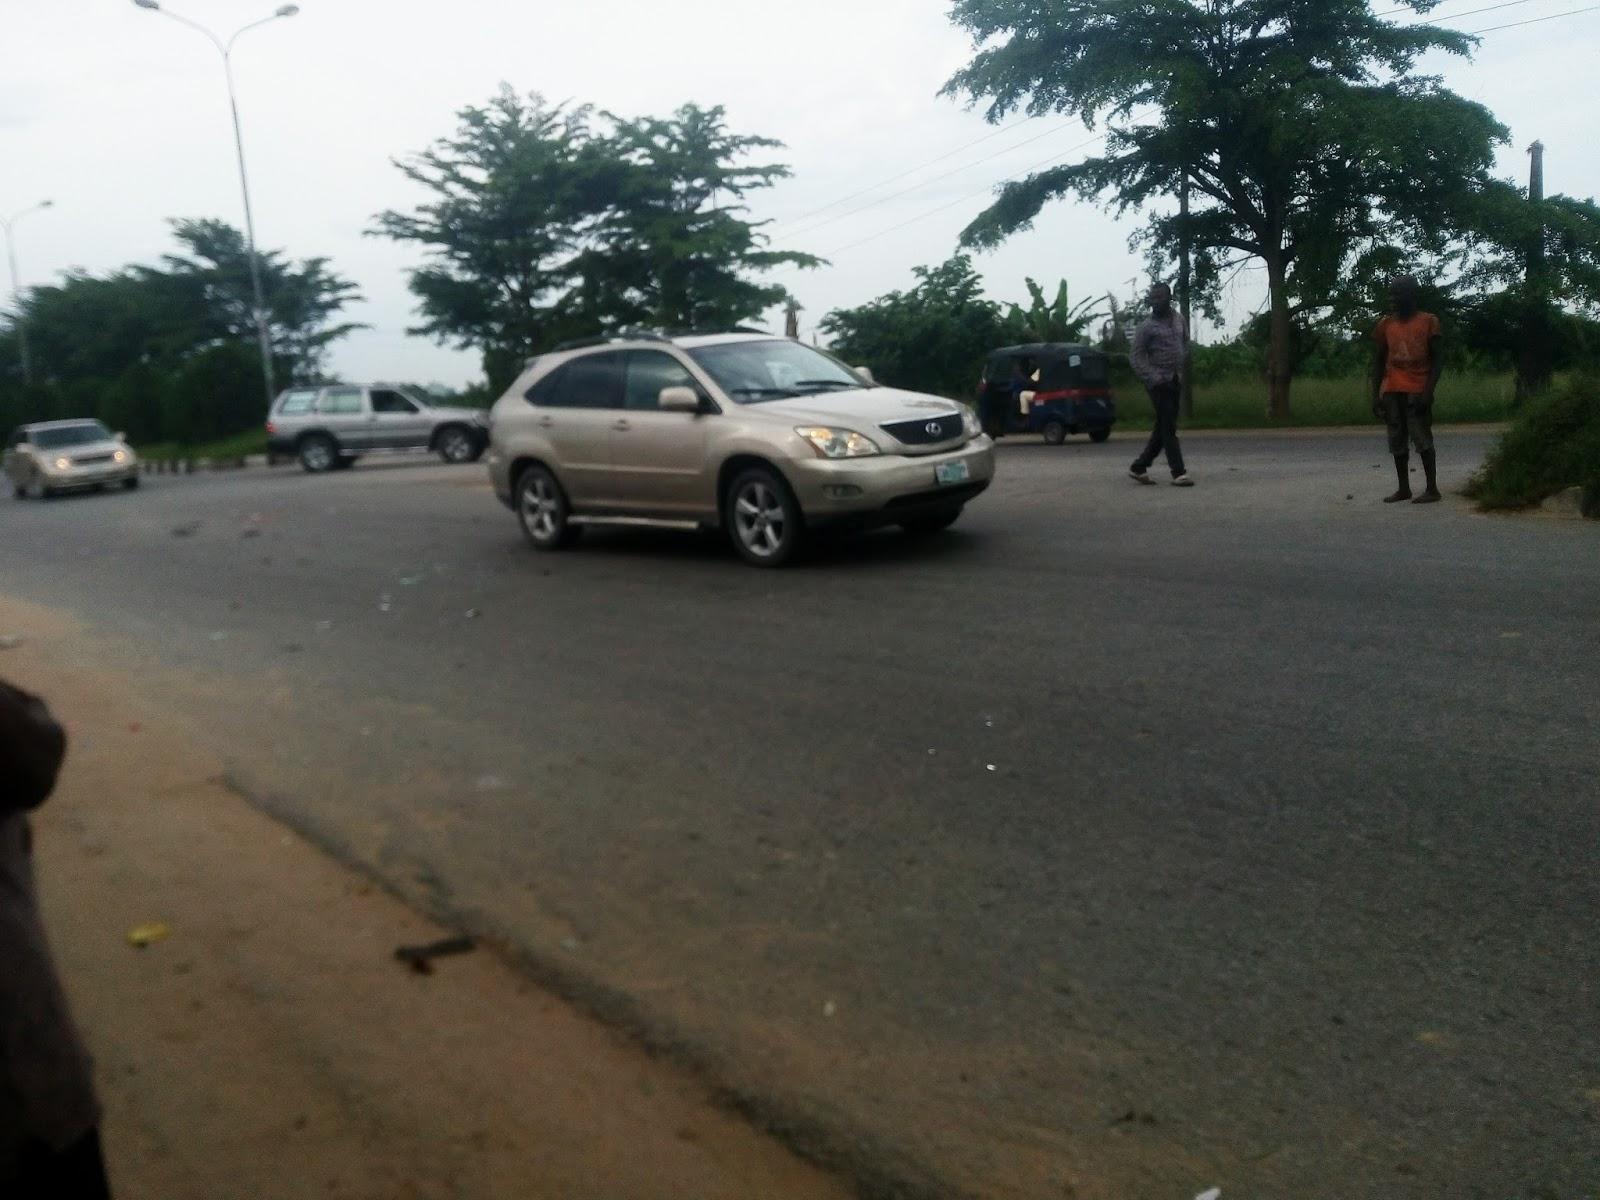 Keke and Toyota car accident in Yenagoa